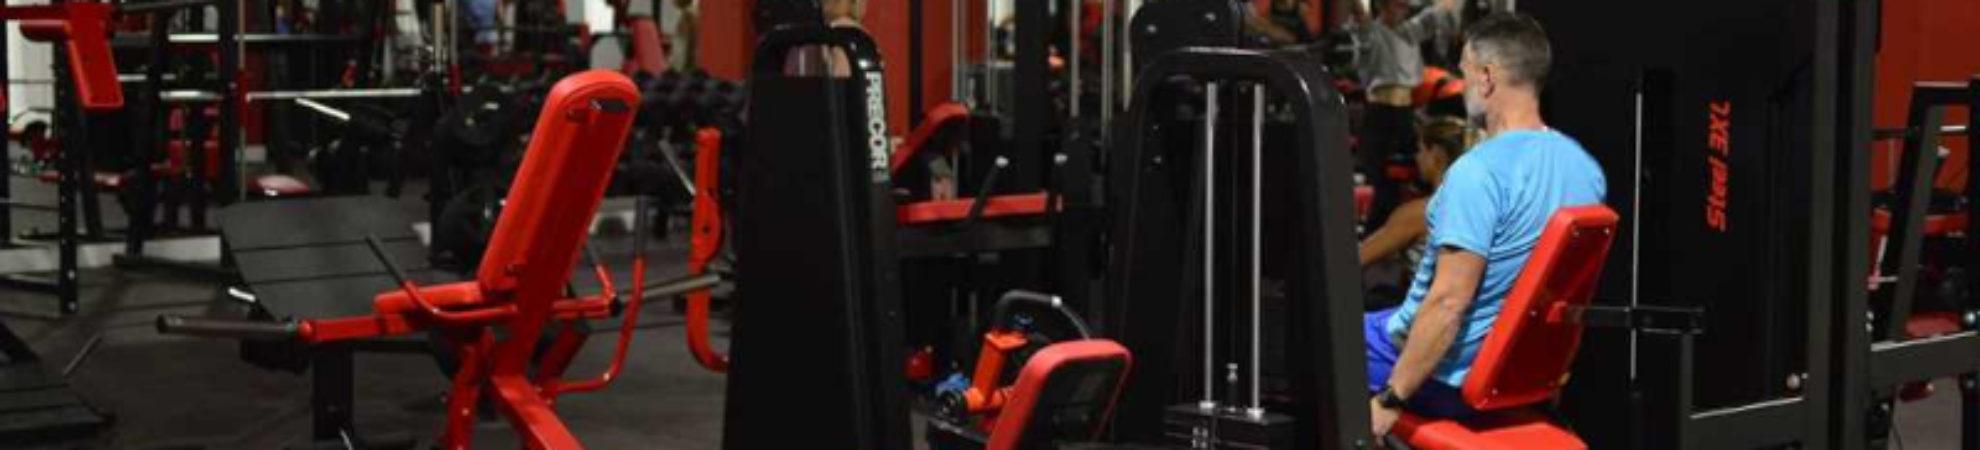 World Fitness Gym Portugalete